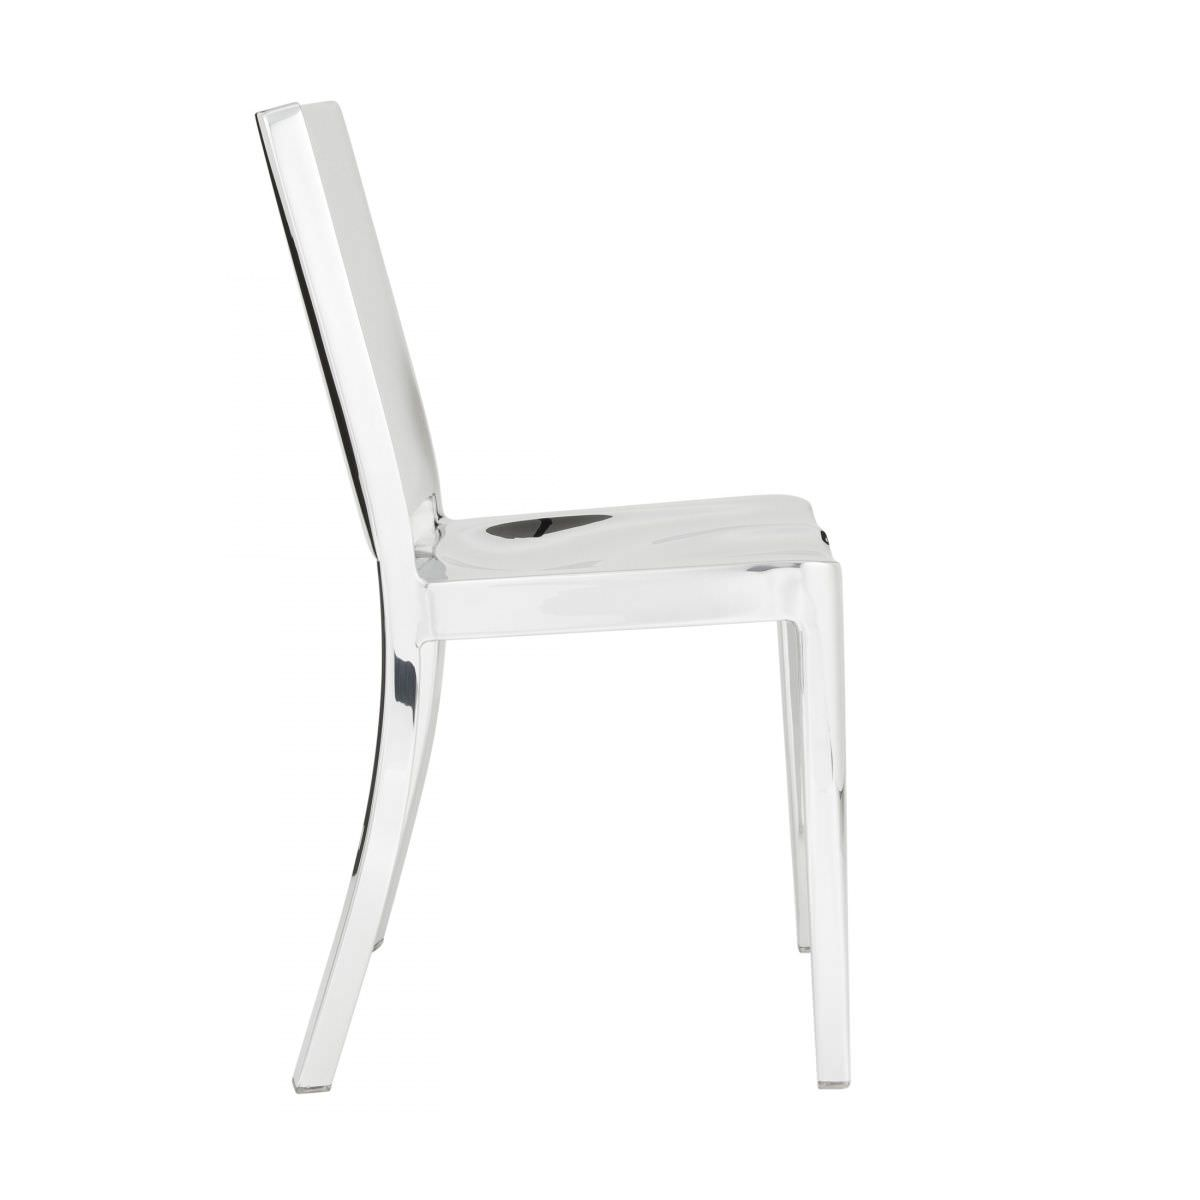 ... Moderner Stuhl / Aluminium / Von Philippe Starck